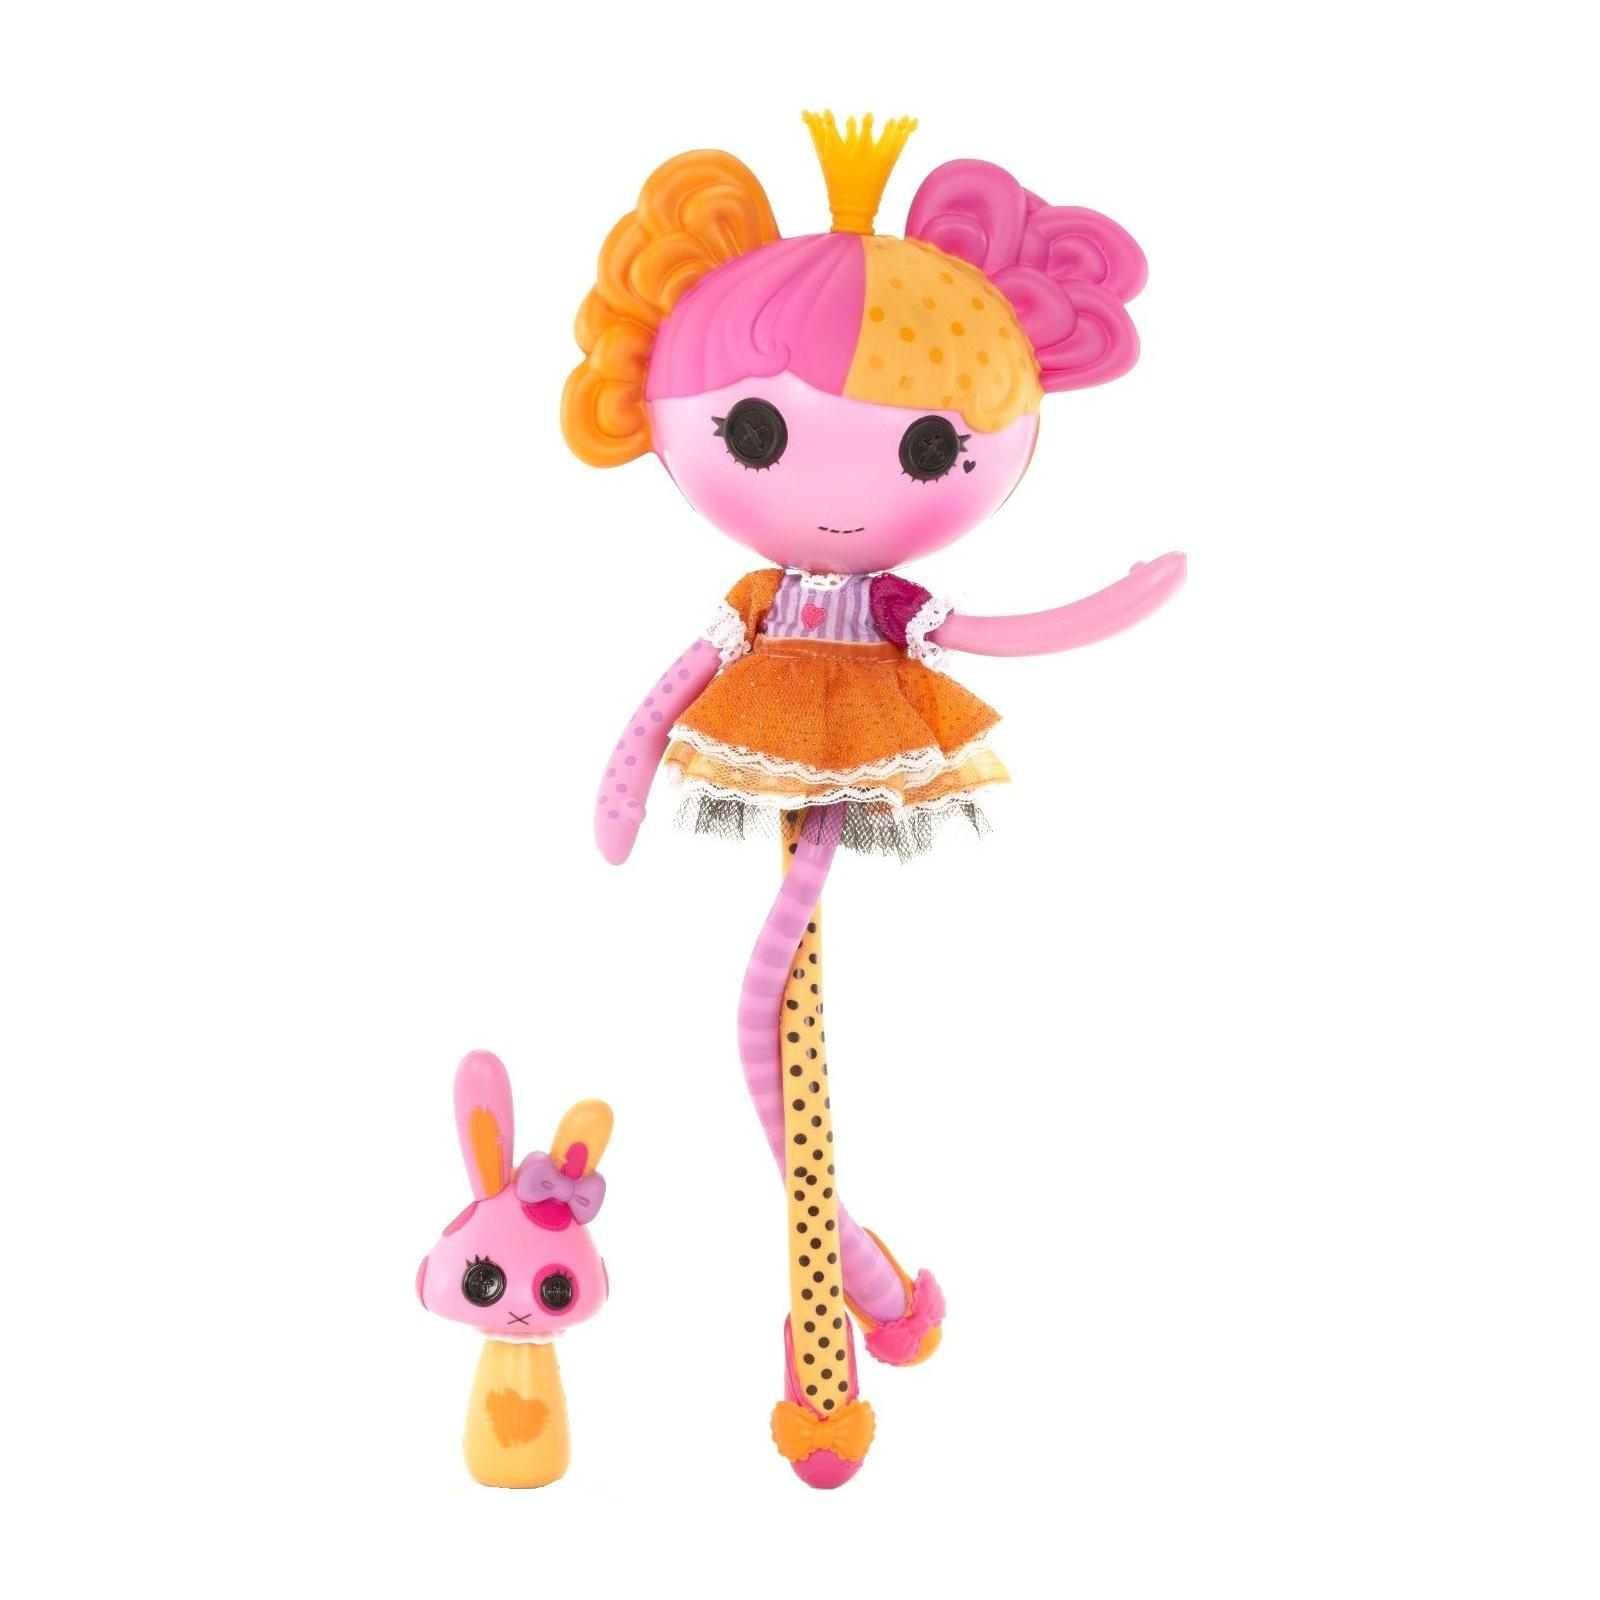 Кукла Lalaloopsy Принцесса Орешник от 3 лет<br>